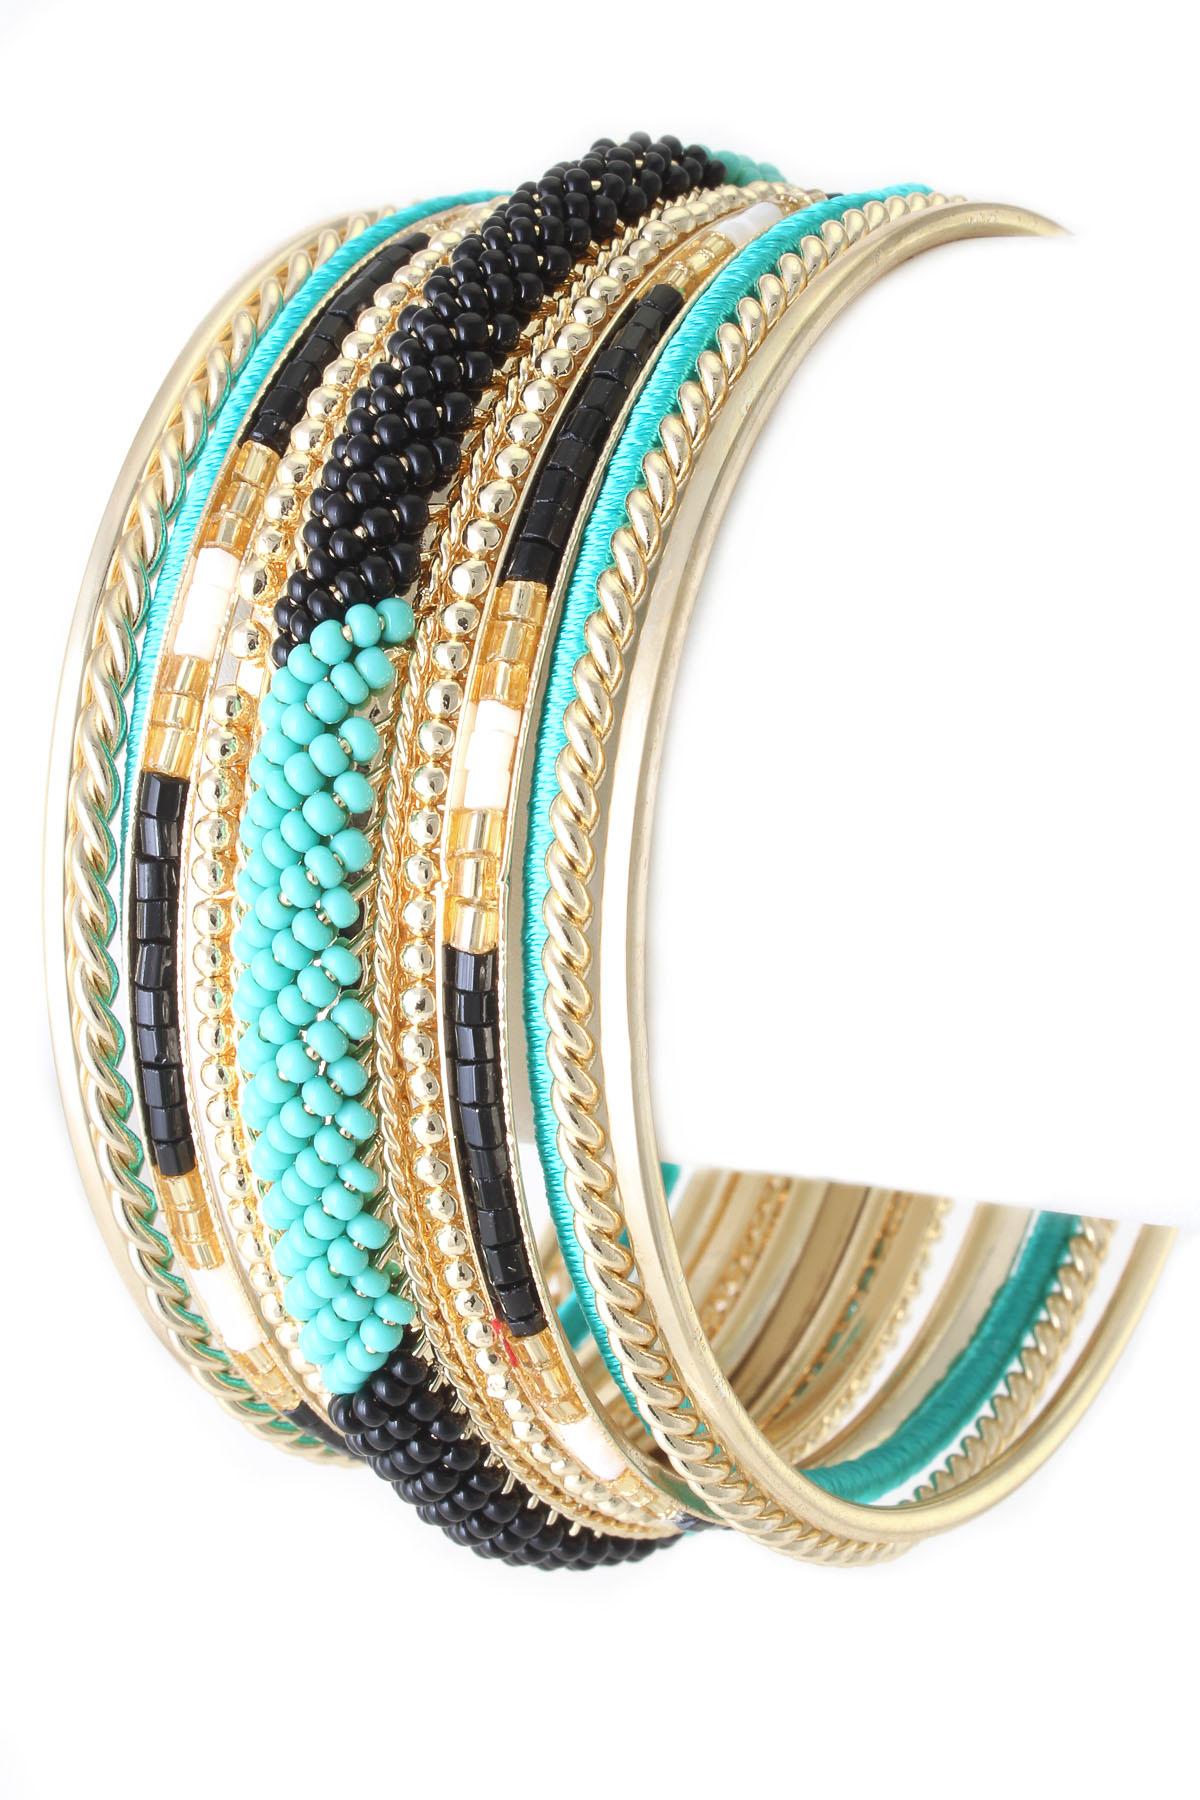 Acrylic Seed Bead And Metal Bangle Bracelet Set  Bracelets. Gold Choker Chains. Male Engagement Rings. Black Matte Bracelet. Solid Gold Stud Earrings. Cheap Diamond Stud Earrings. Slap Bracelet. Cat Eye Sapphire. 10 000 Wedding Rings